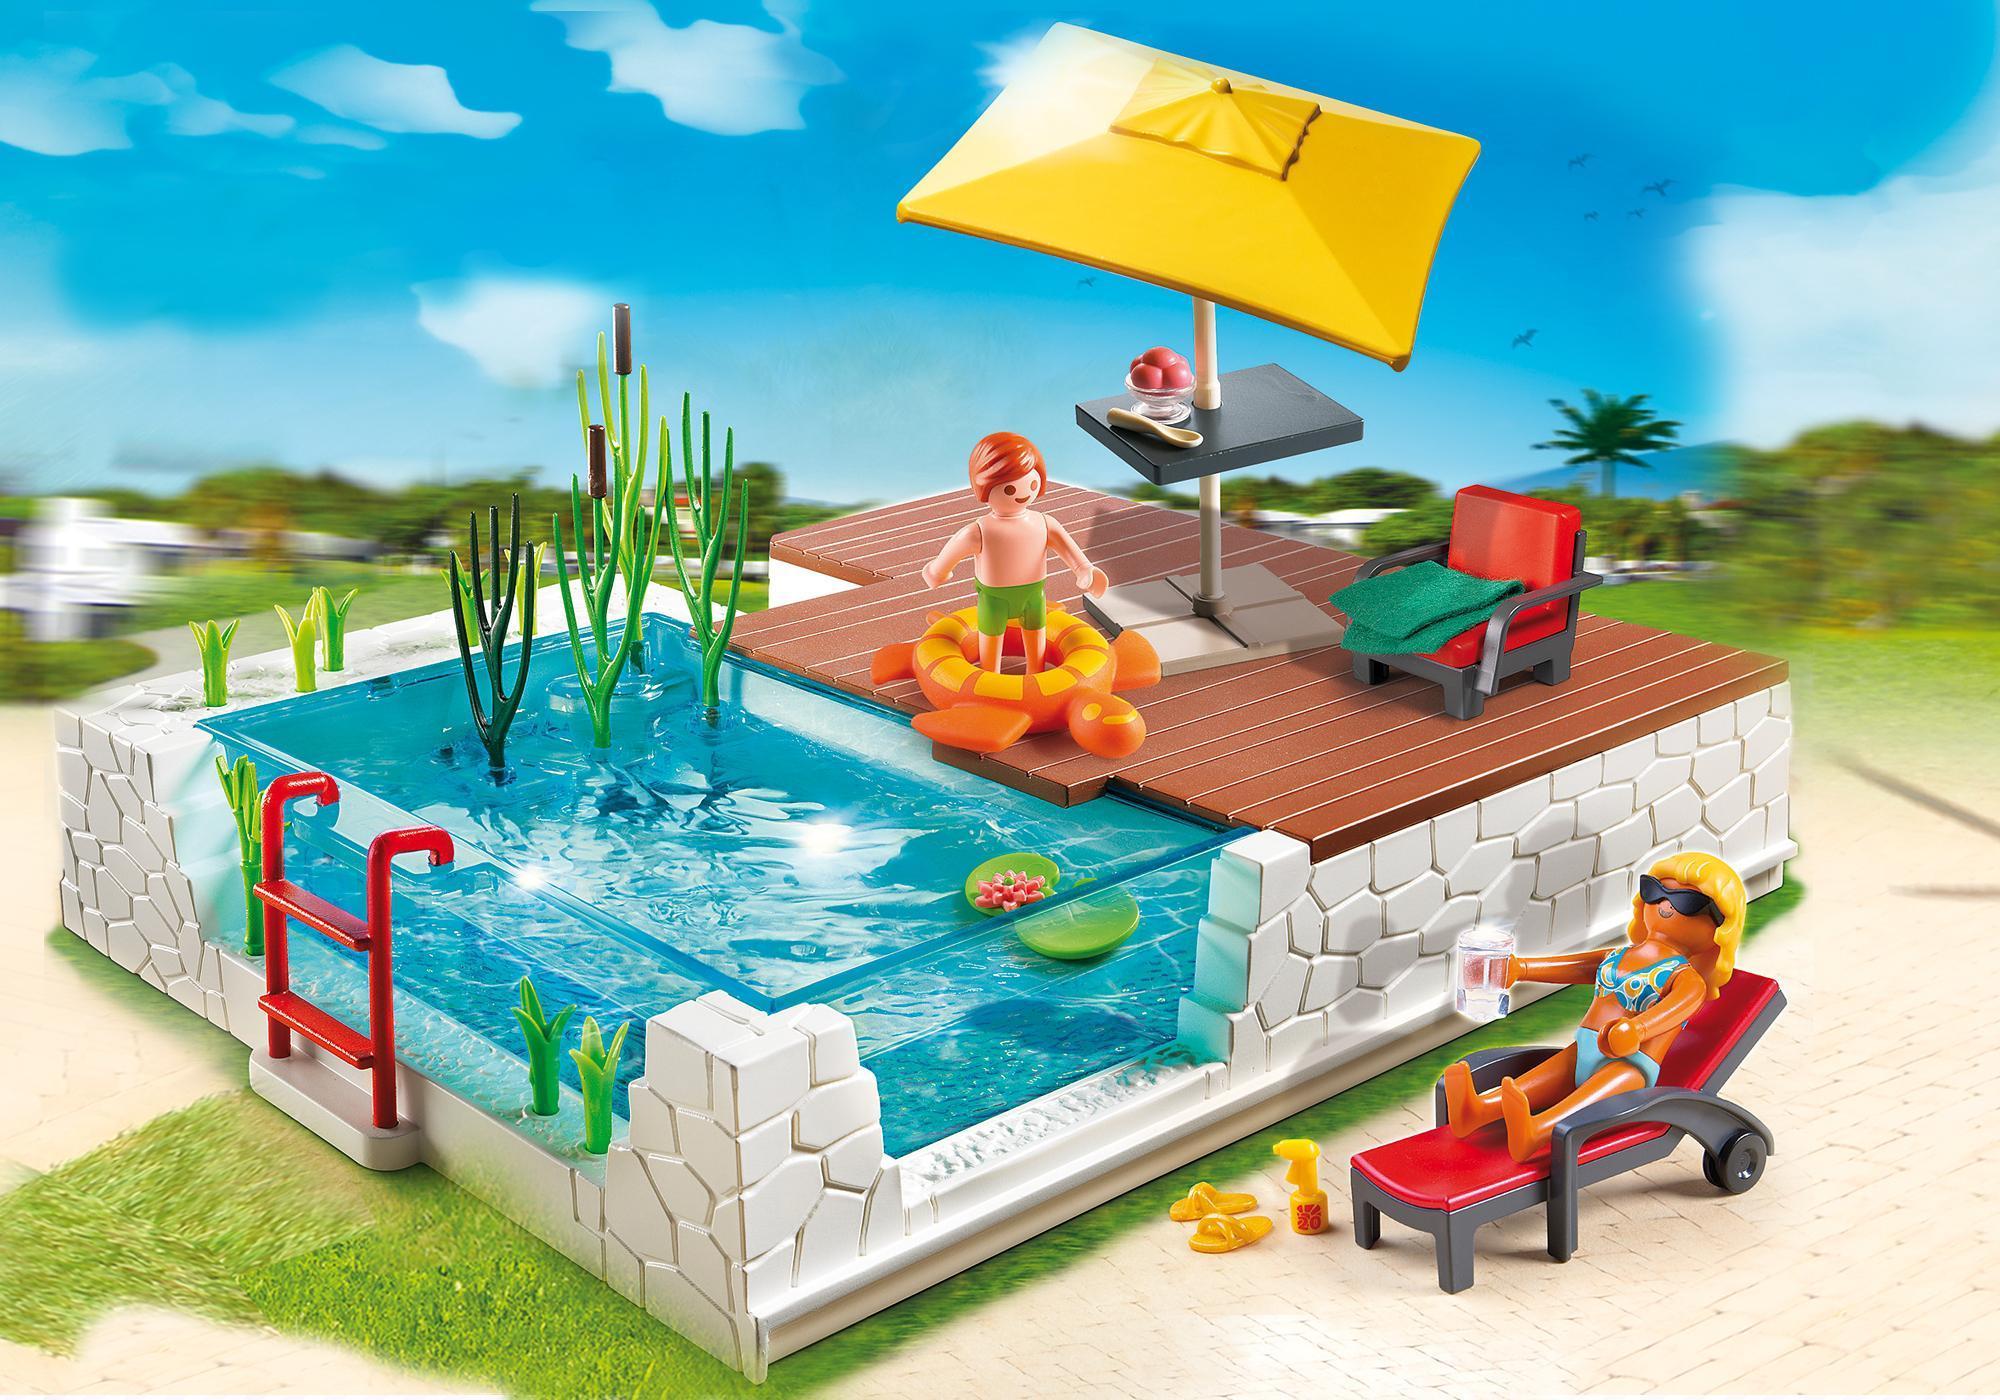 http://media.playmobil.com/i/playmobil/5575_product_detail/Einbau-Swimmingpool